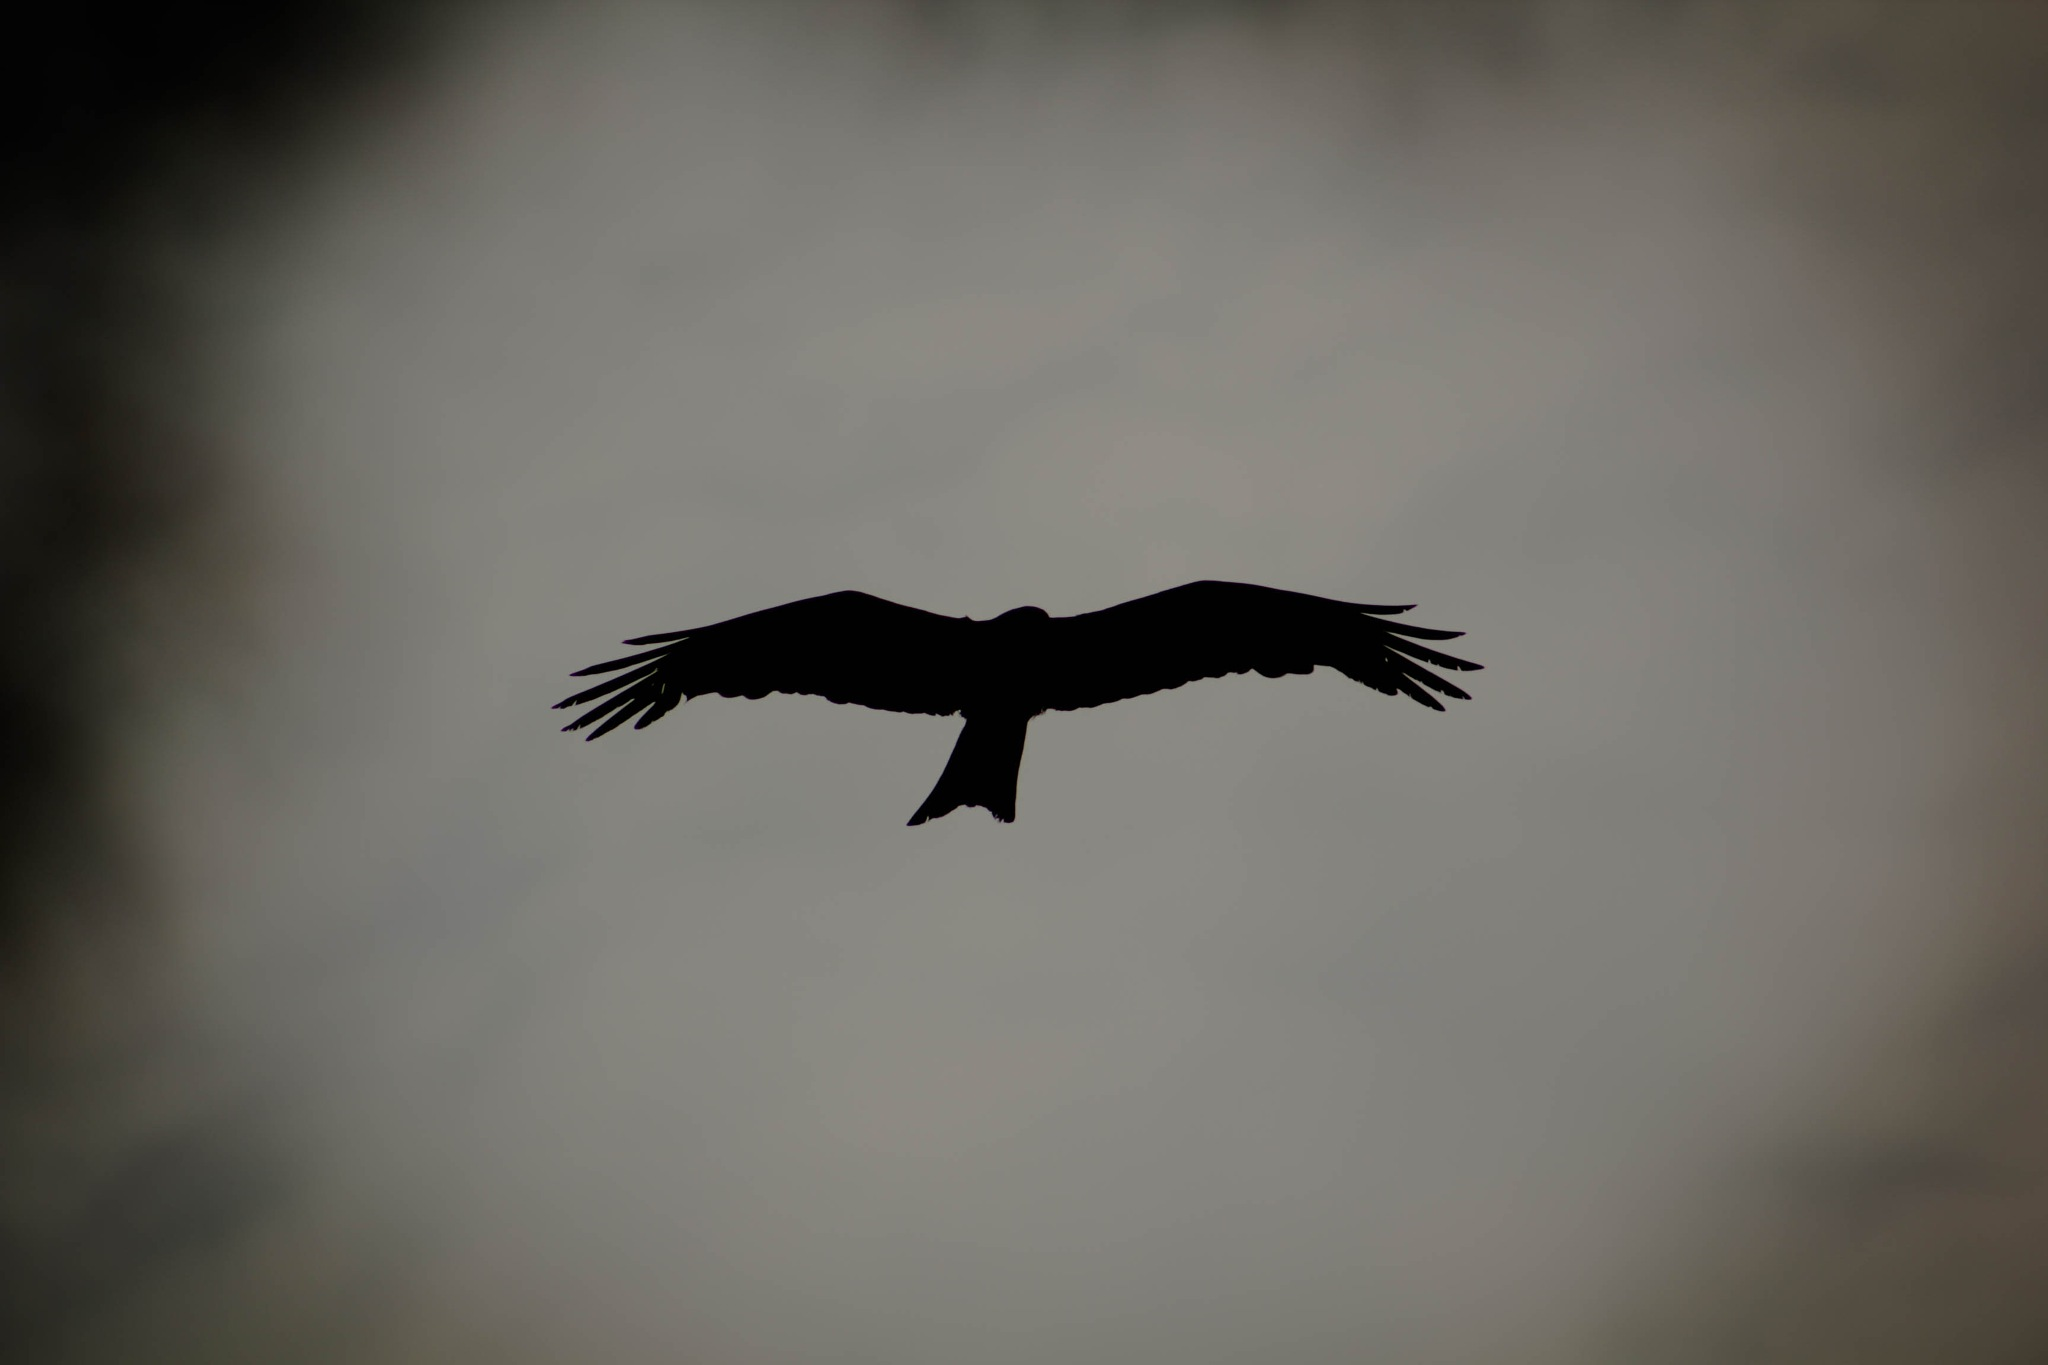 Flying High by SapnaAgrawal